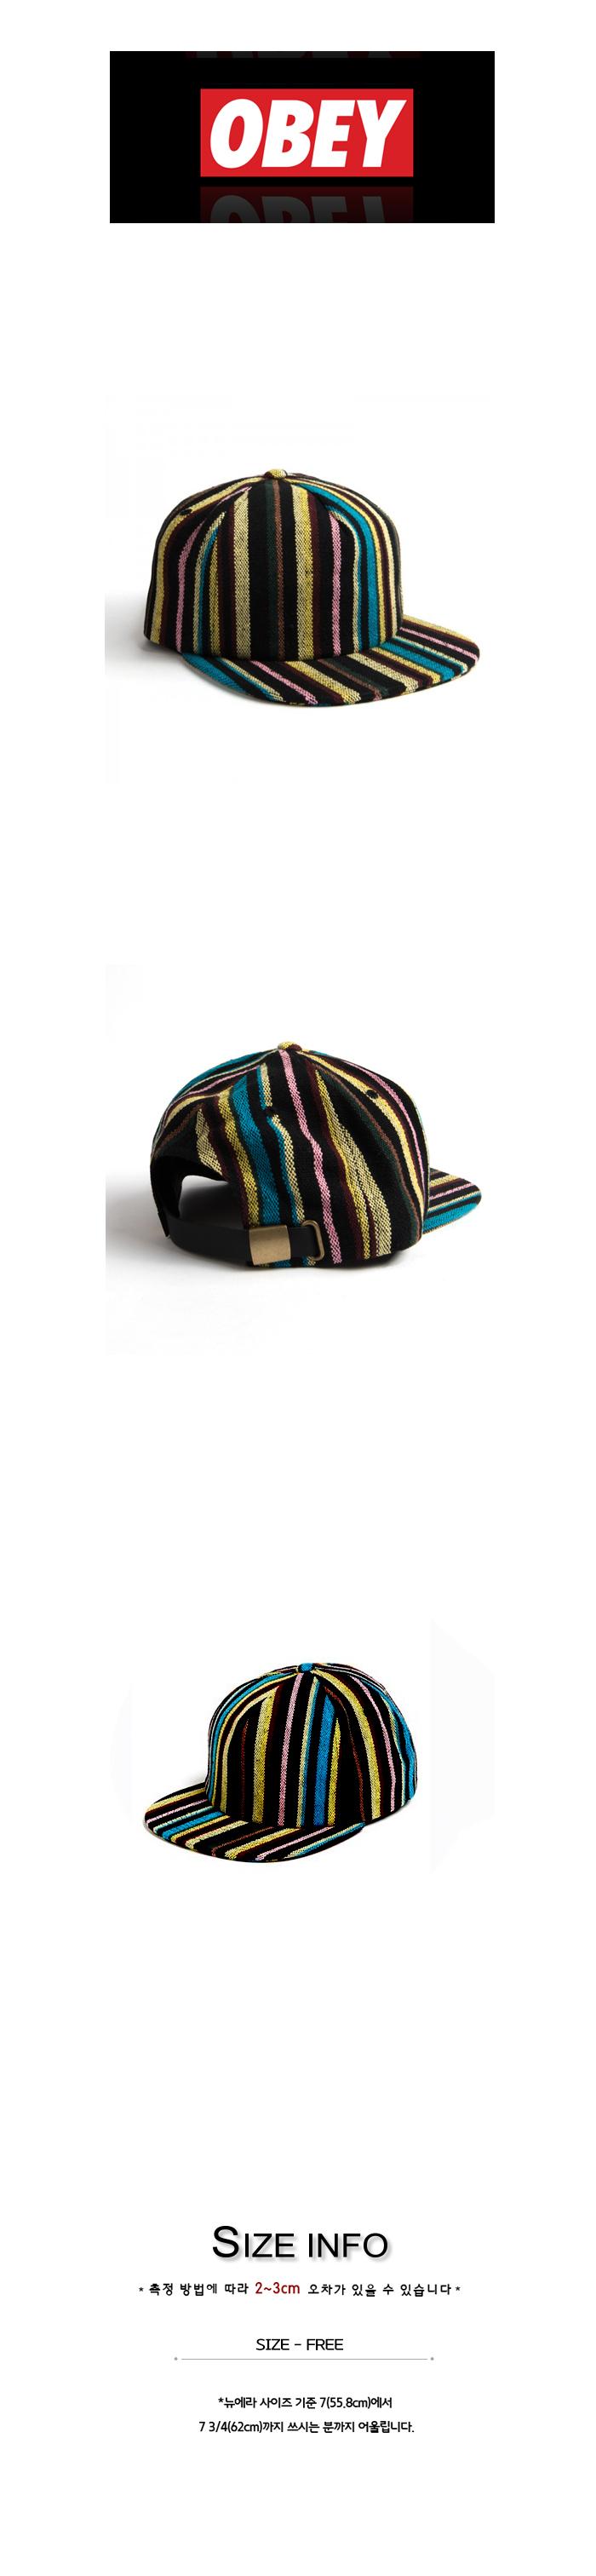 OBEY TANGIER HAT BLACK